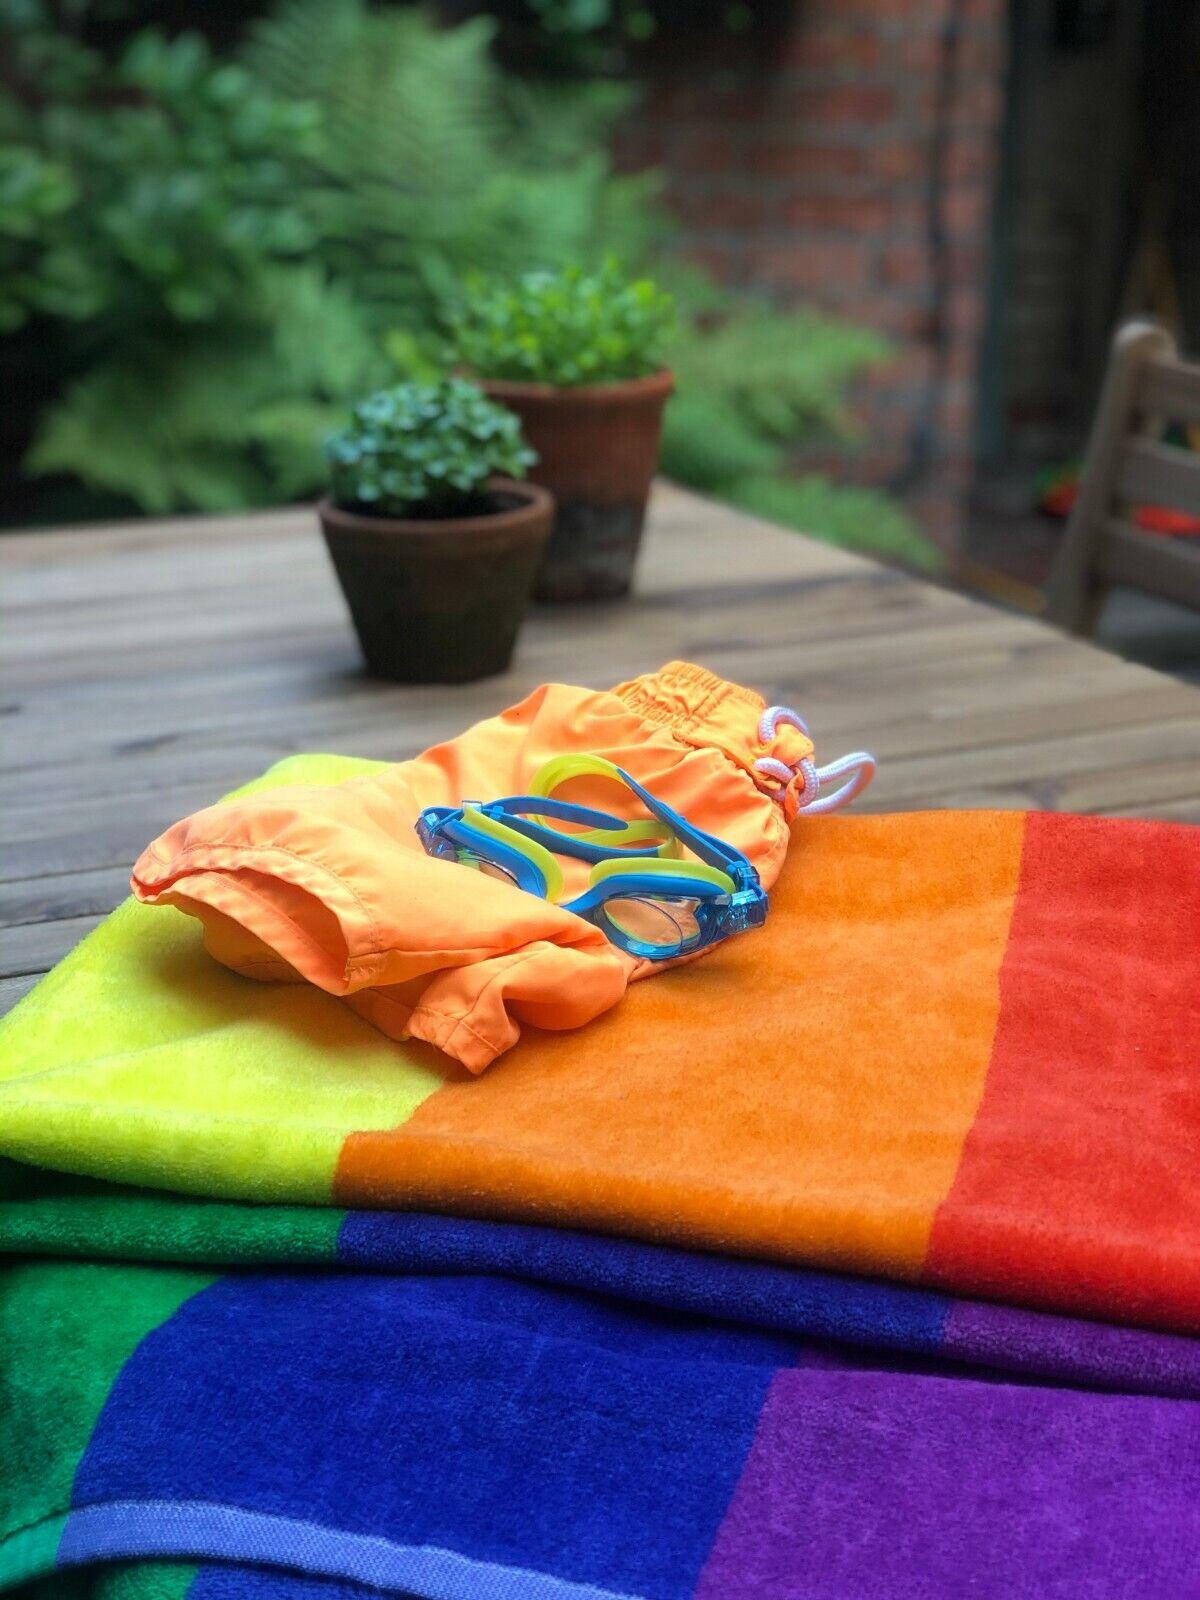 Rainbow Striped Beach Towel Jumbo 100 x 180cm Supersoft 100% Cotton Luxury Pride